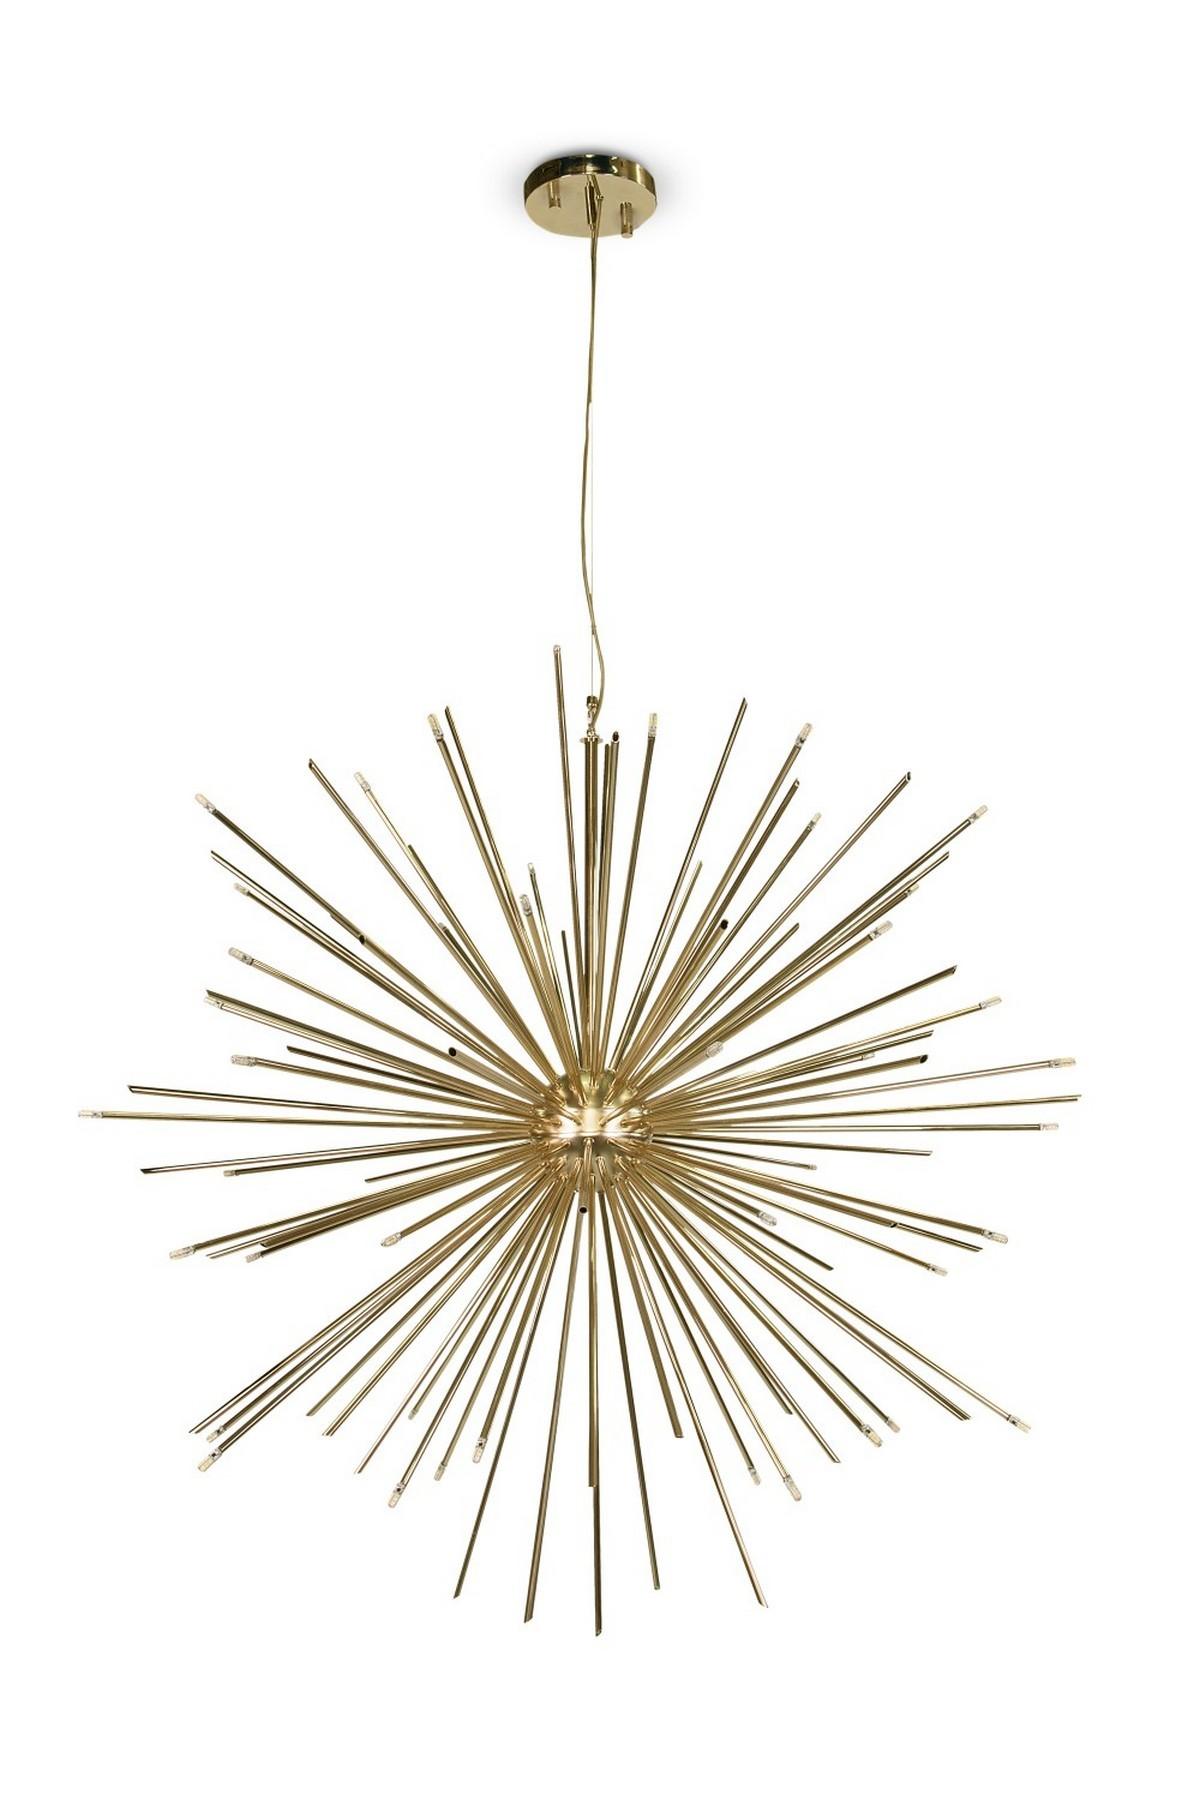 living room, living room ideas, living room decor, mid-century design, mid-century chandeliers, luxury chandeliers, luxury furniture, mid-century lighting,